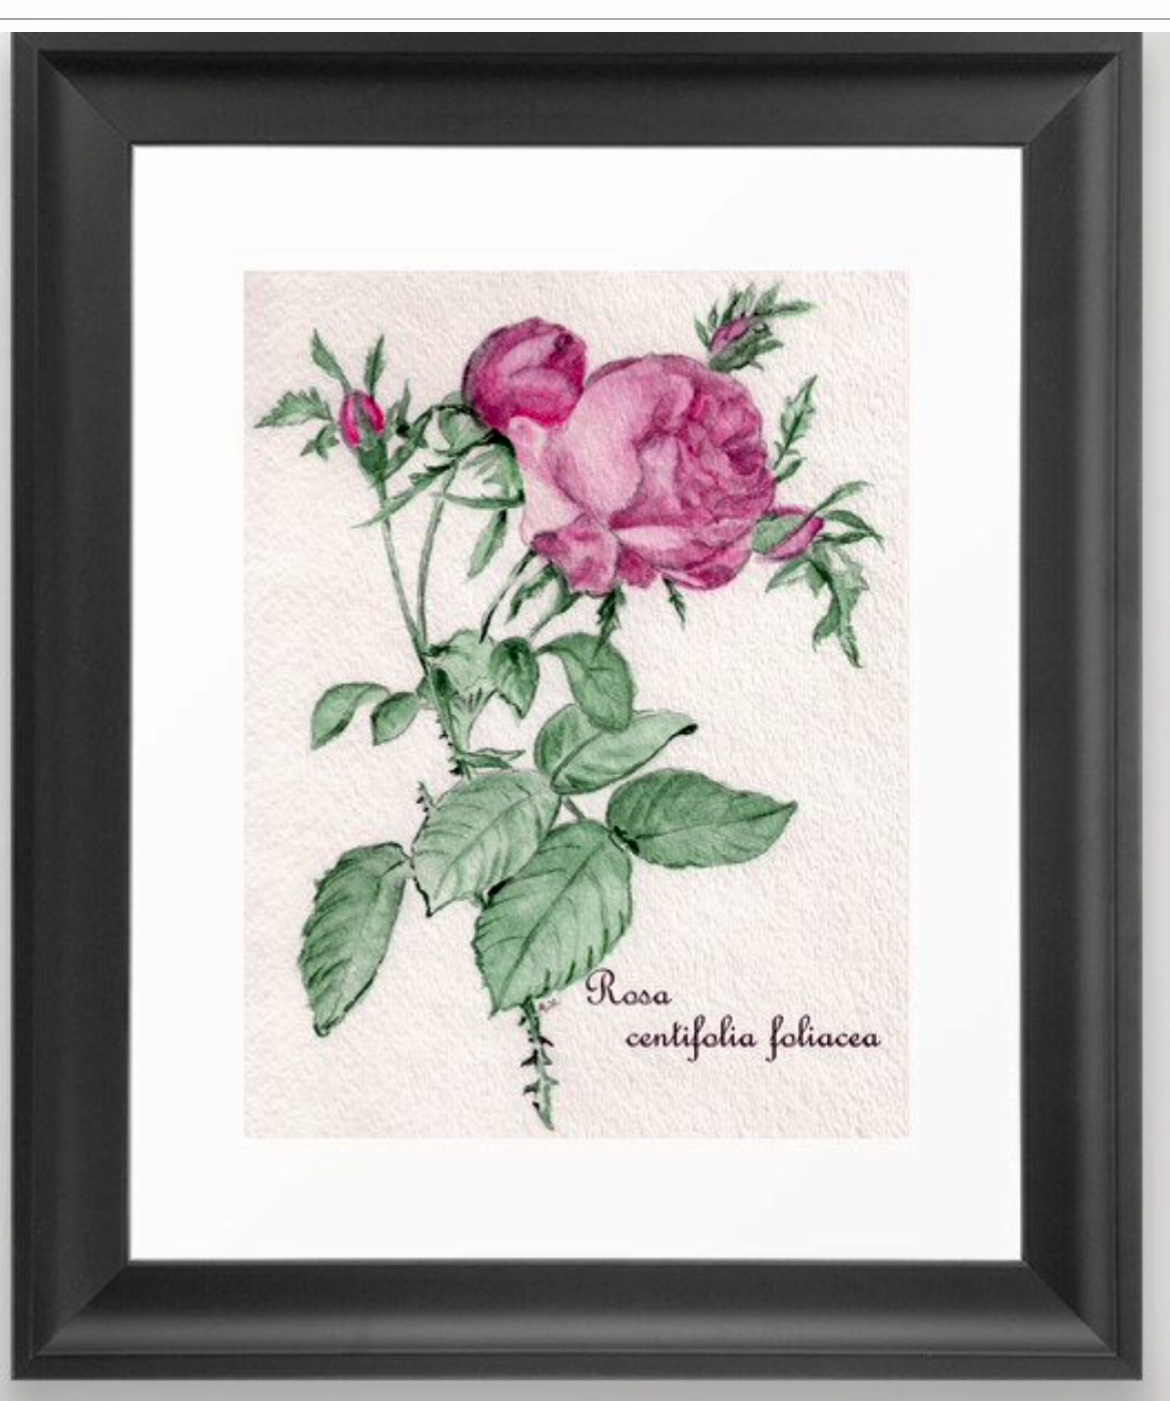 Rosa Centifolia Foliacea